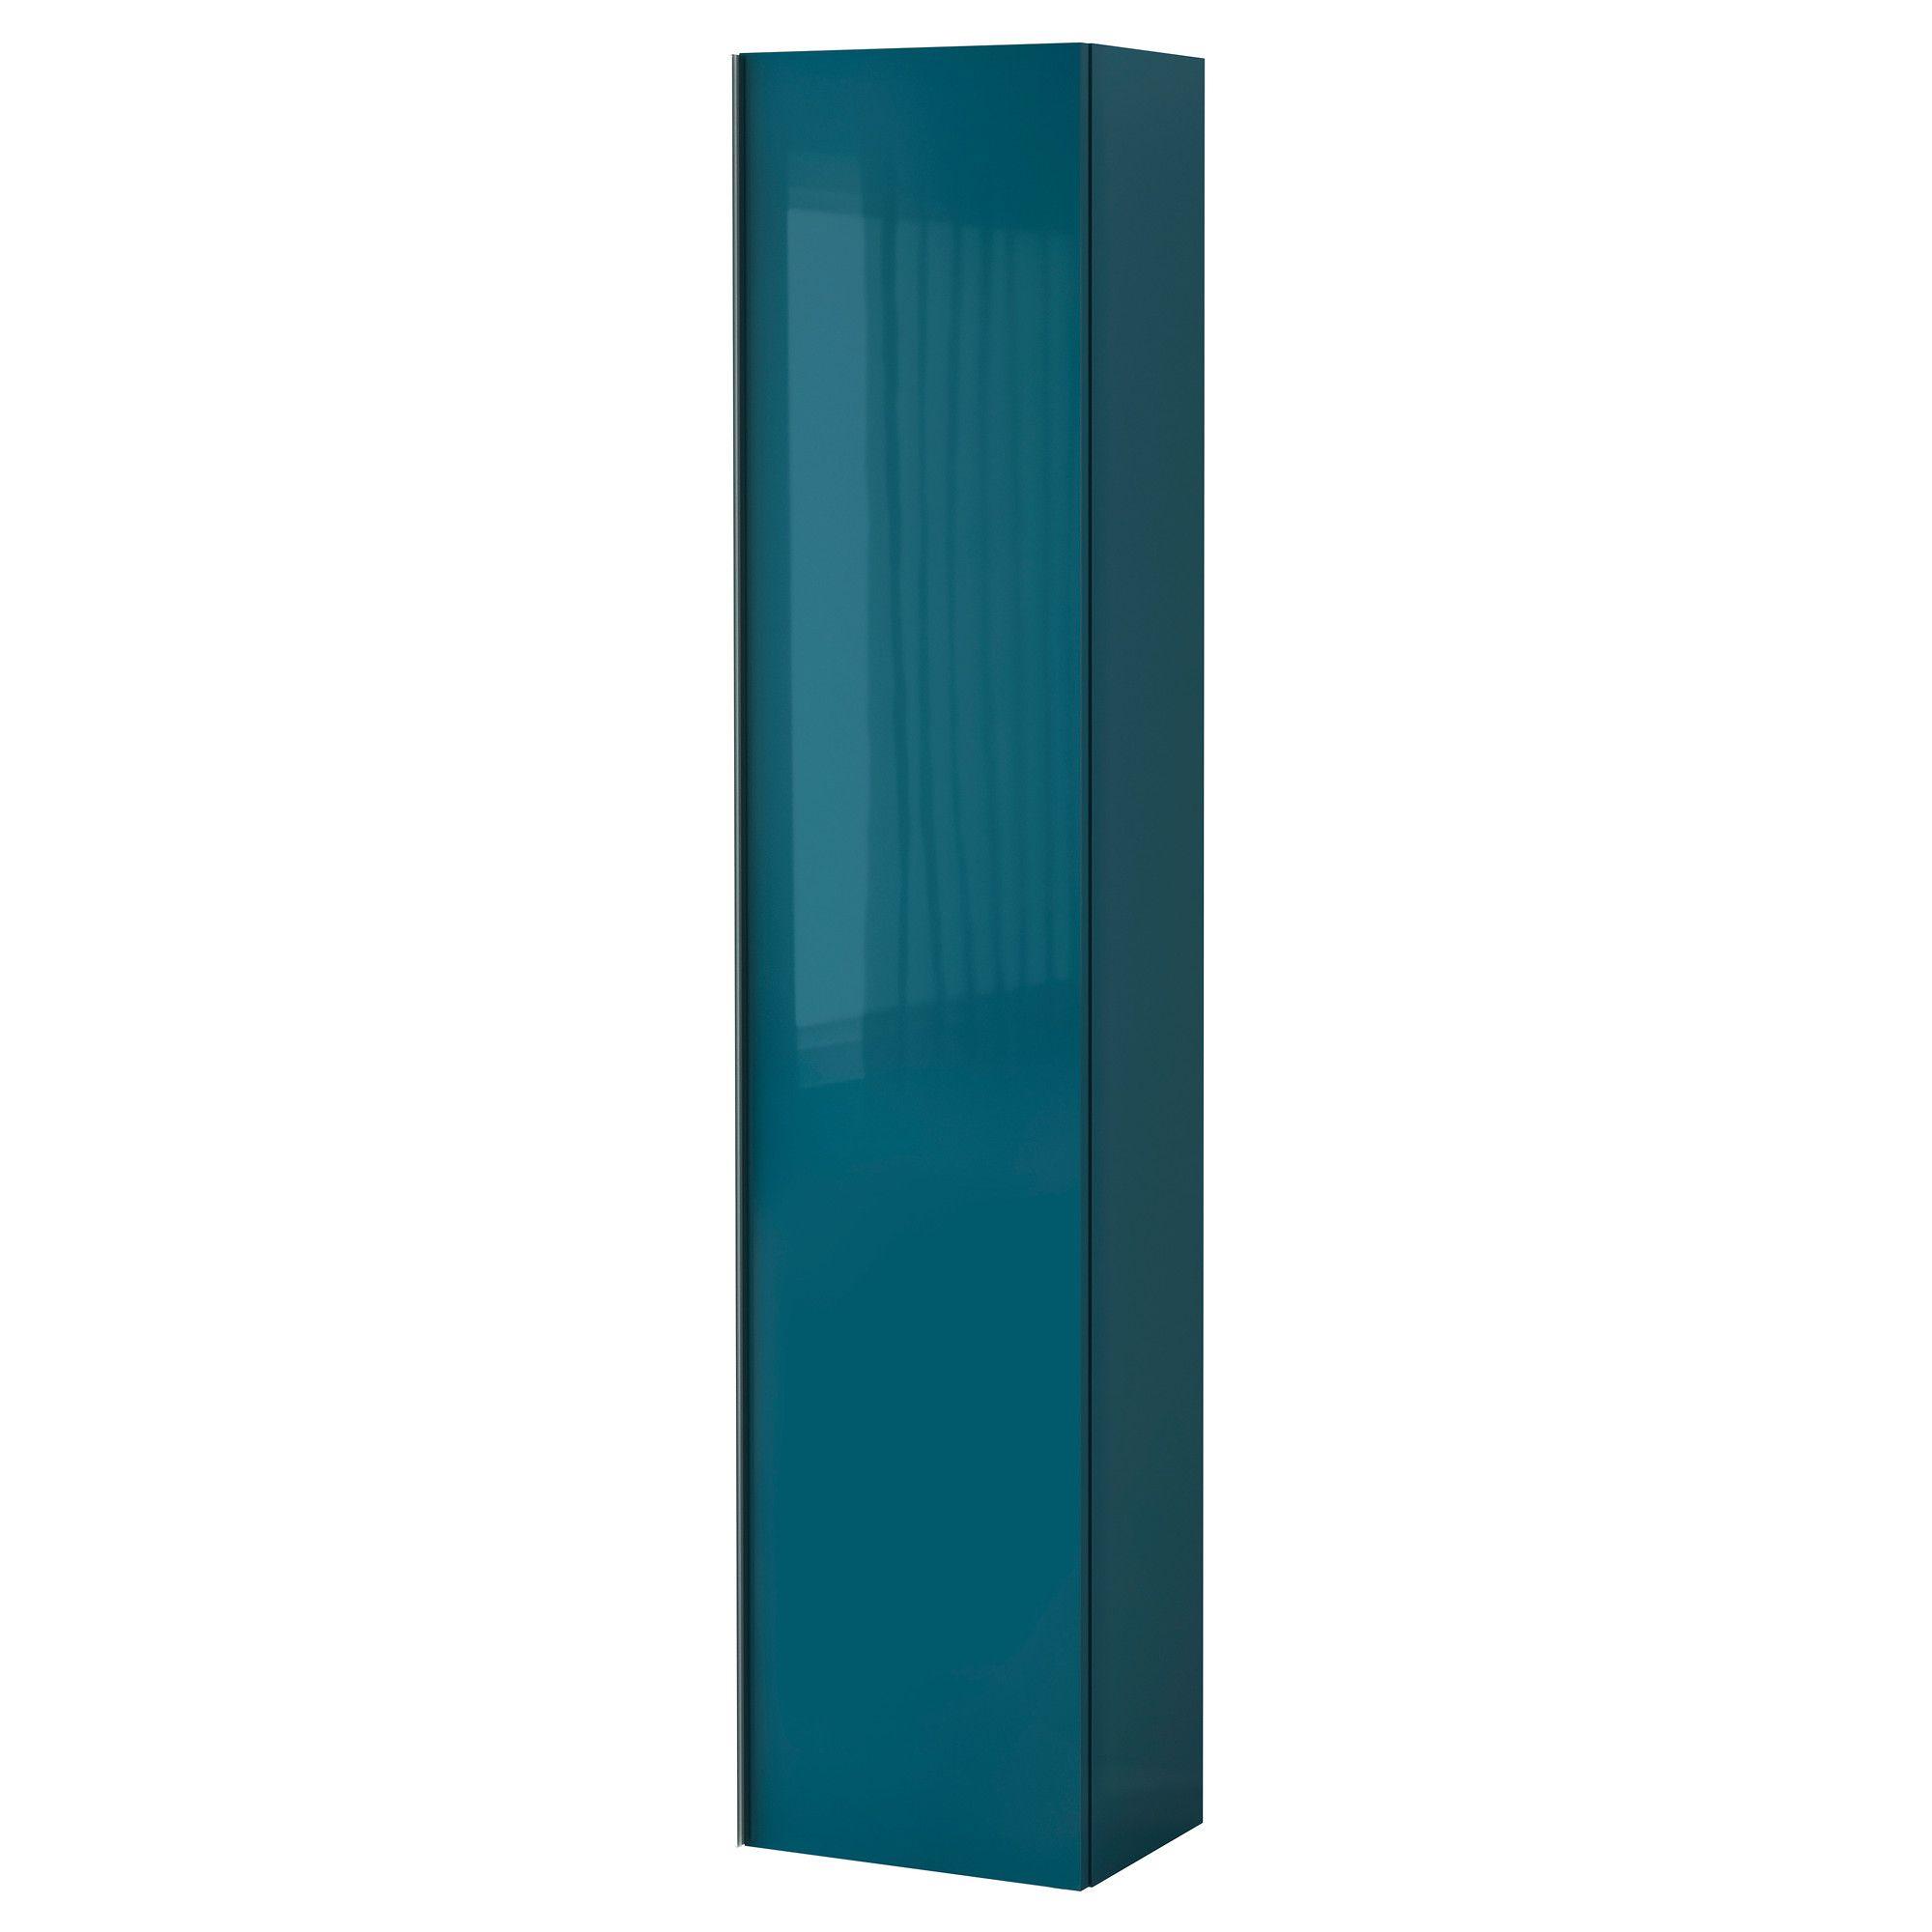 ledare led-lampe gx53 1000 lm, dimmbar | stühle, esszimmer und, Badezimmer